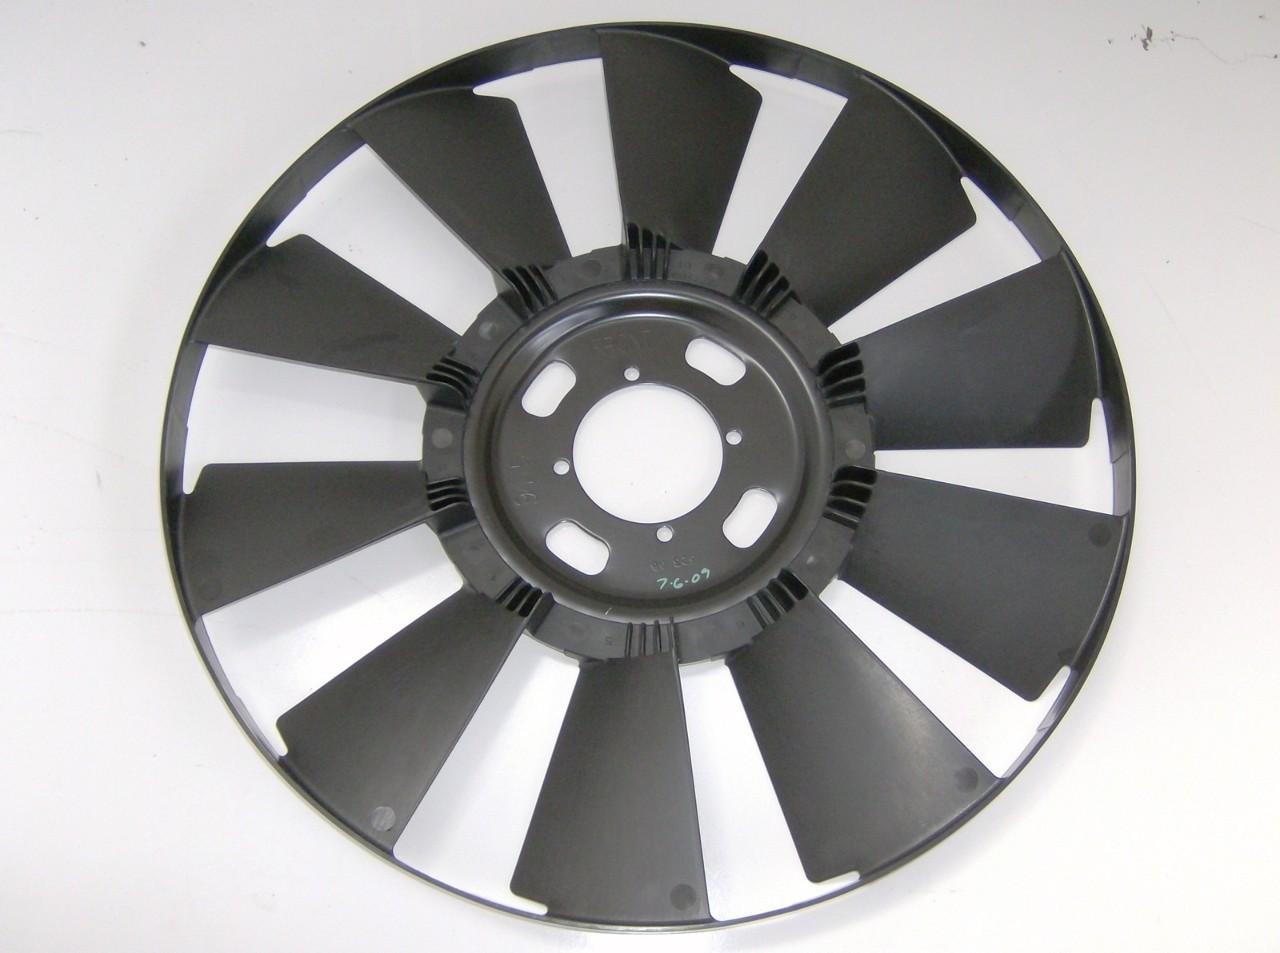 Engine Cooling Fan Blade Topkick Kodiak C4500